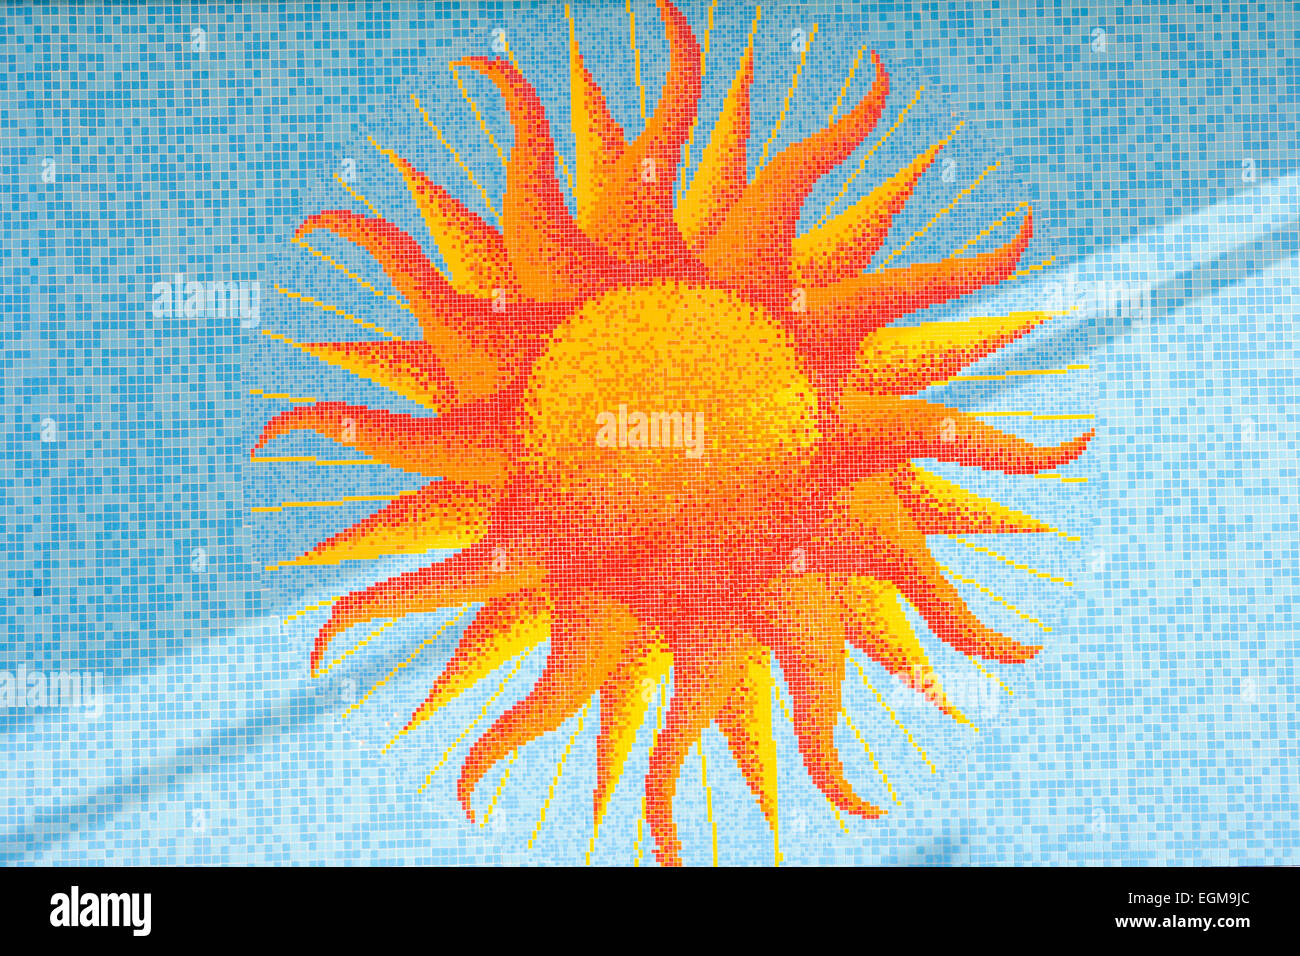 Sun Mosaic - Stock Image